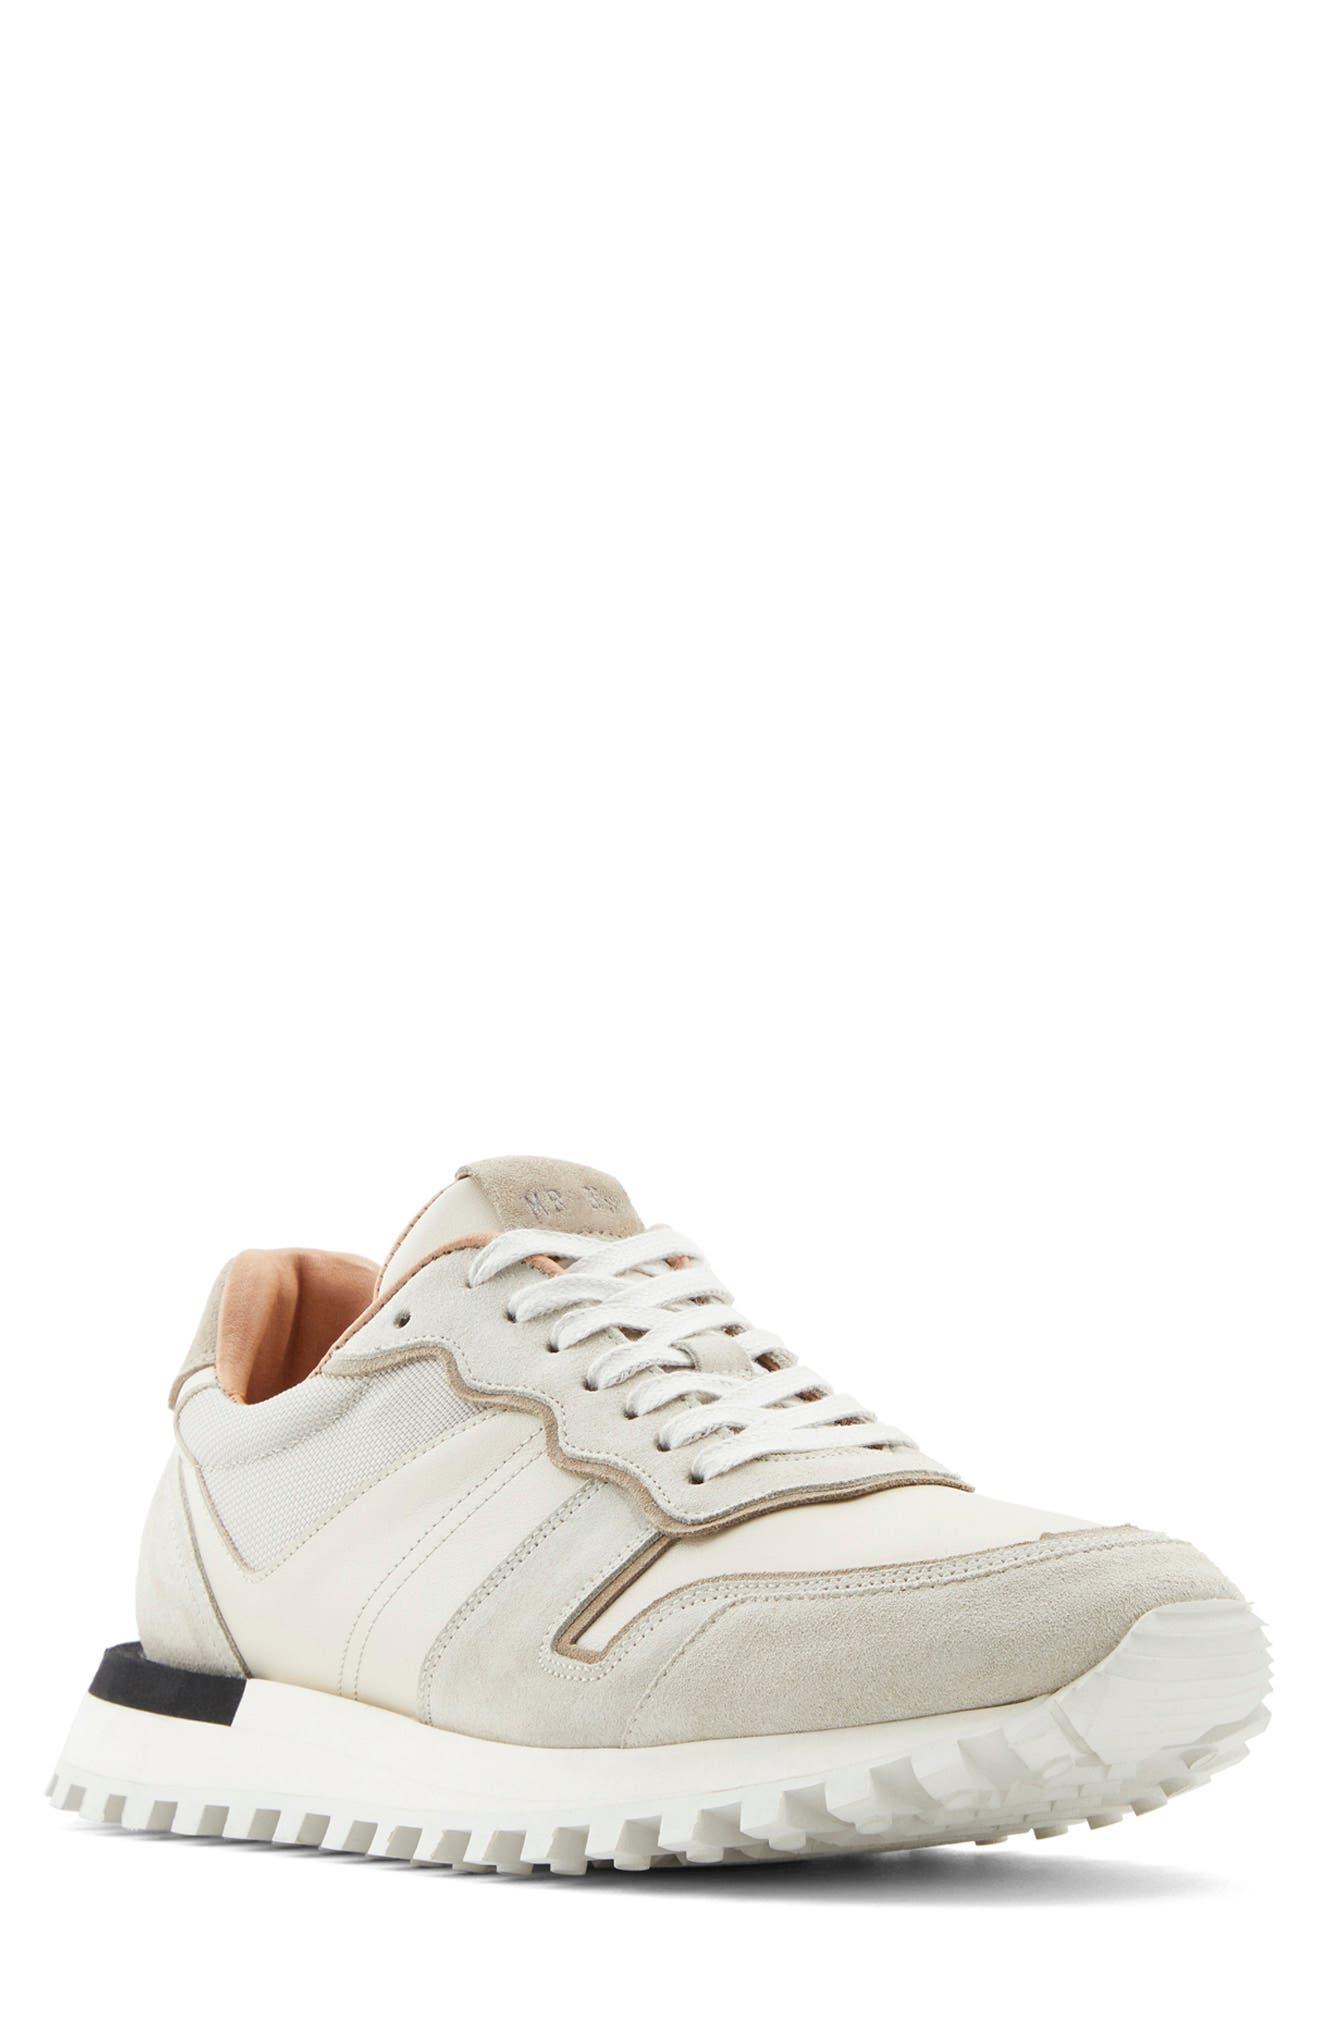 Men's Mr. B's Huntingdale Sneaker